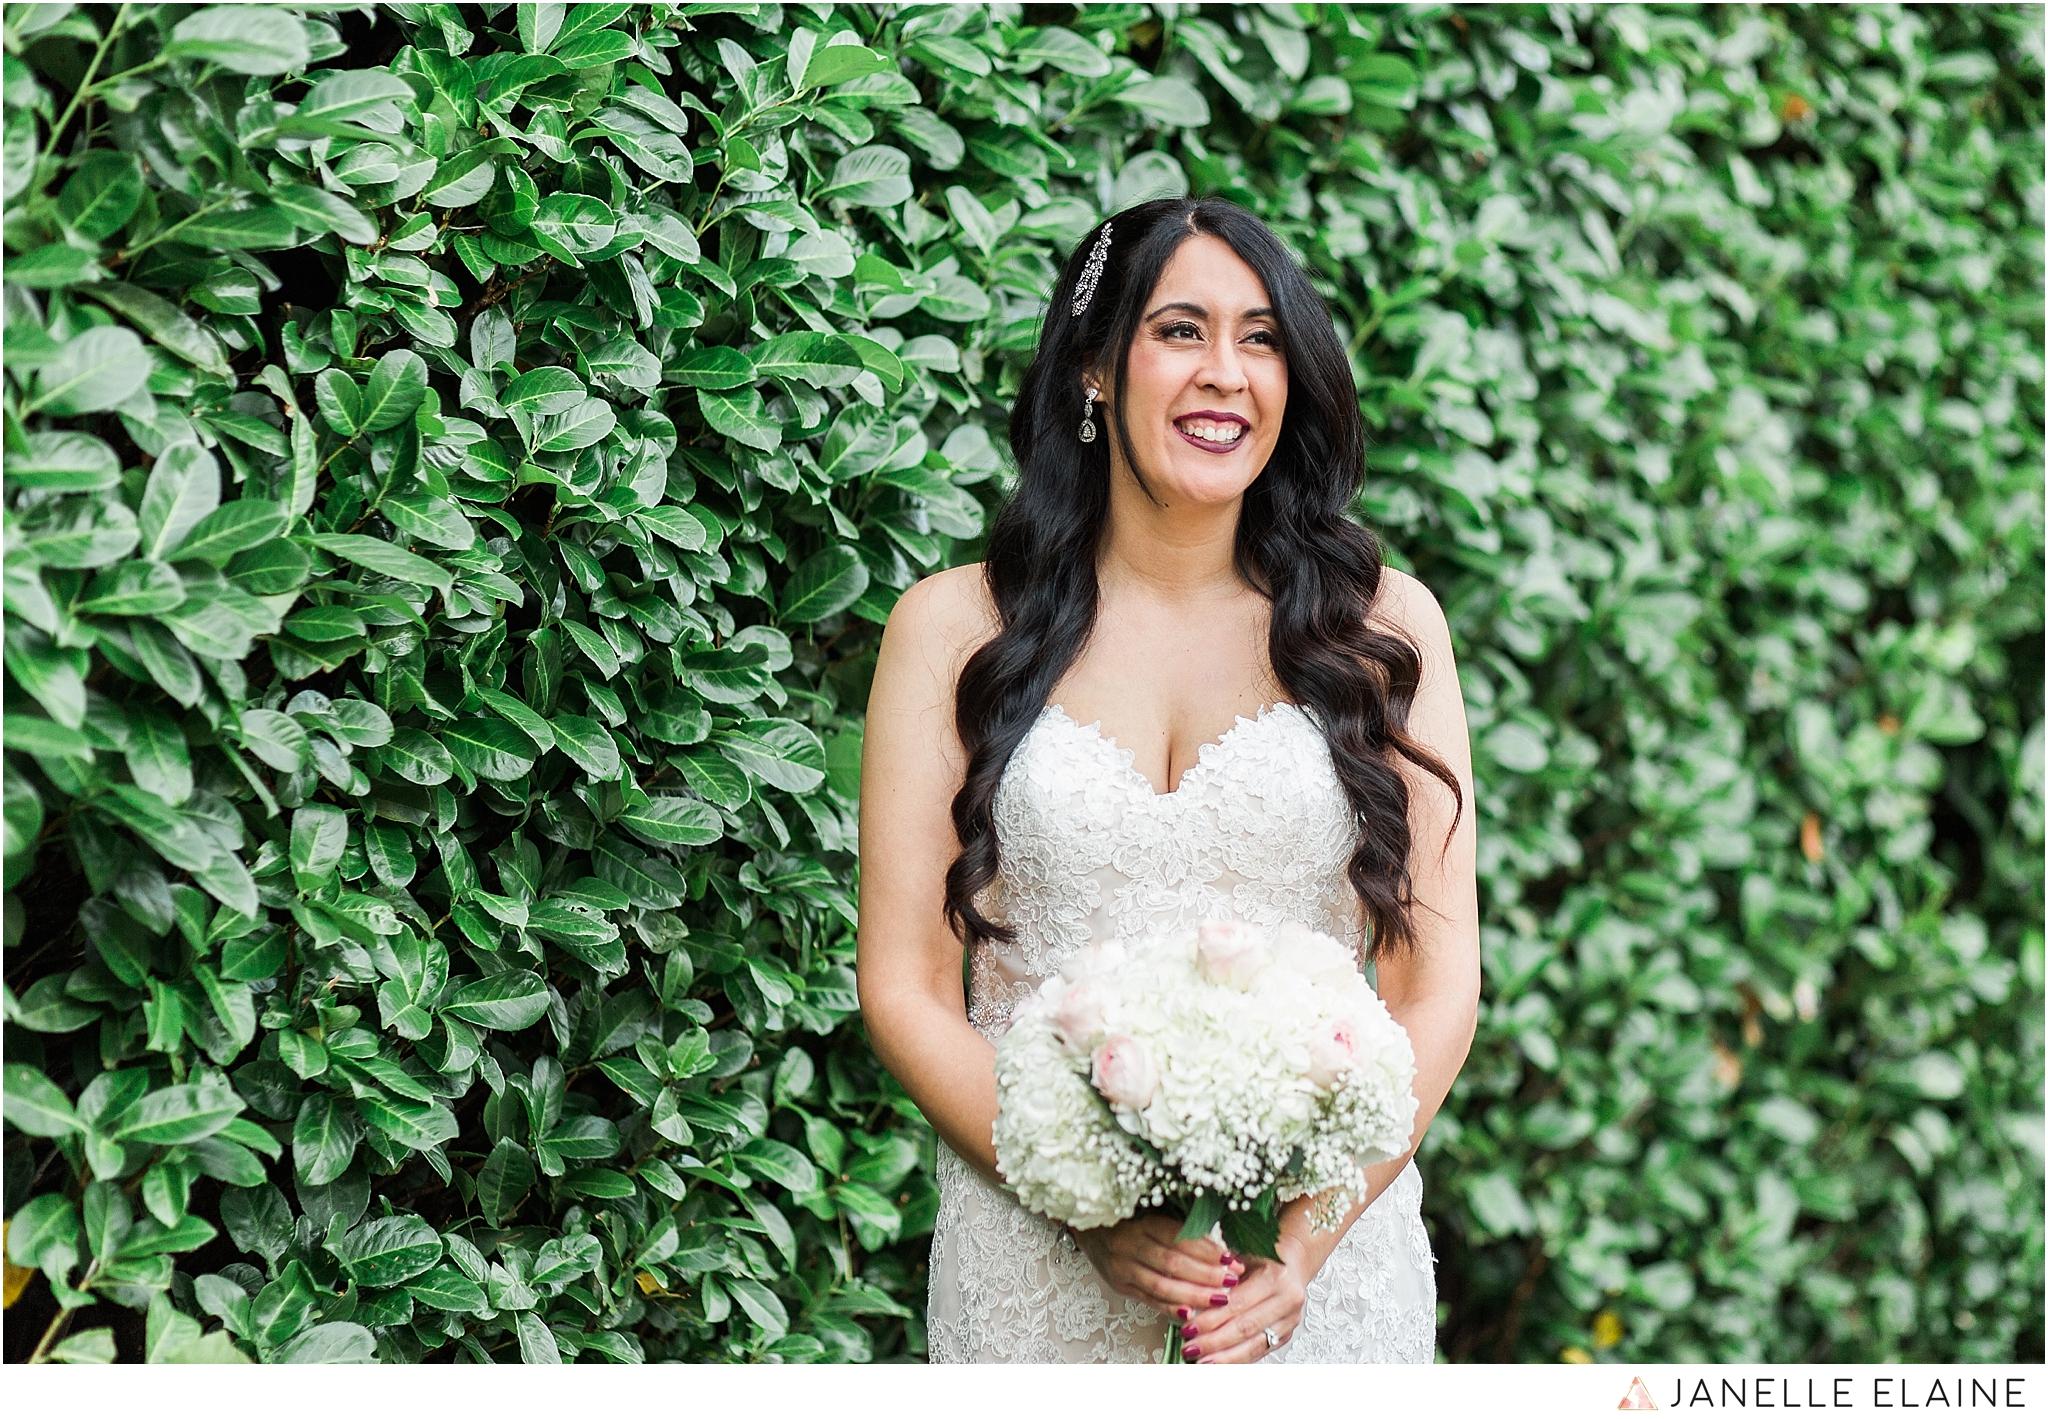 janelle elaine photography-professional wedding photographer-seattle-bellevue-robinswood house-218.jpg